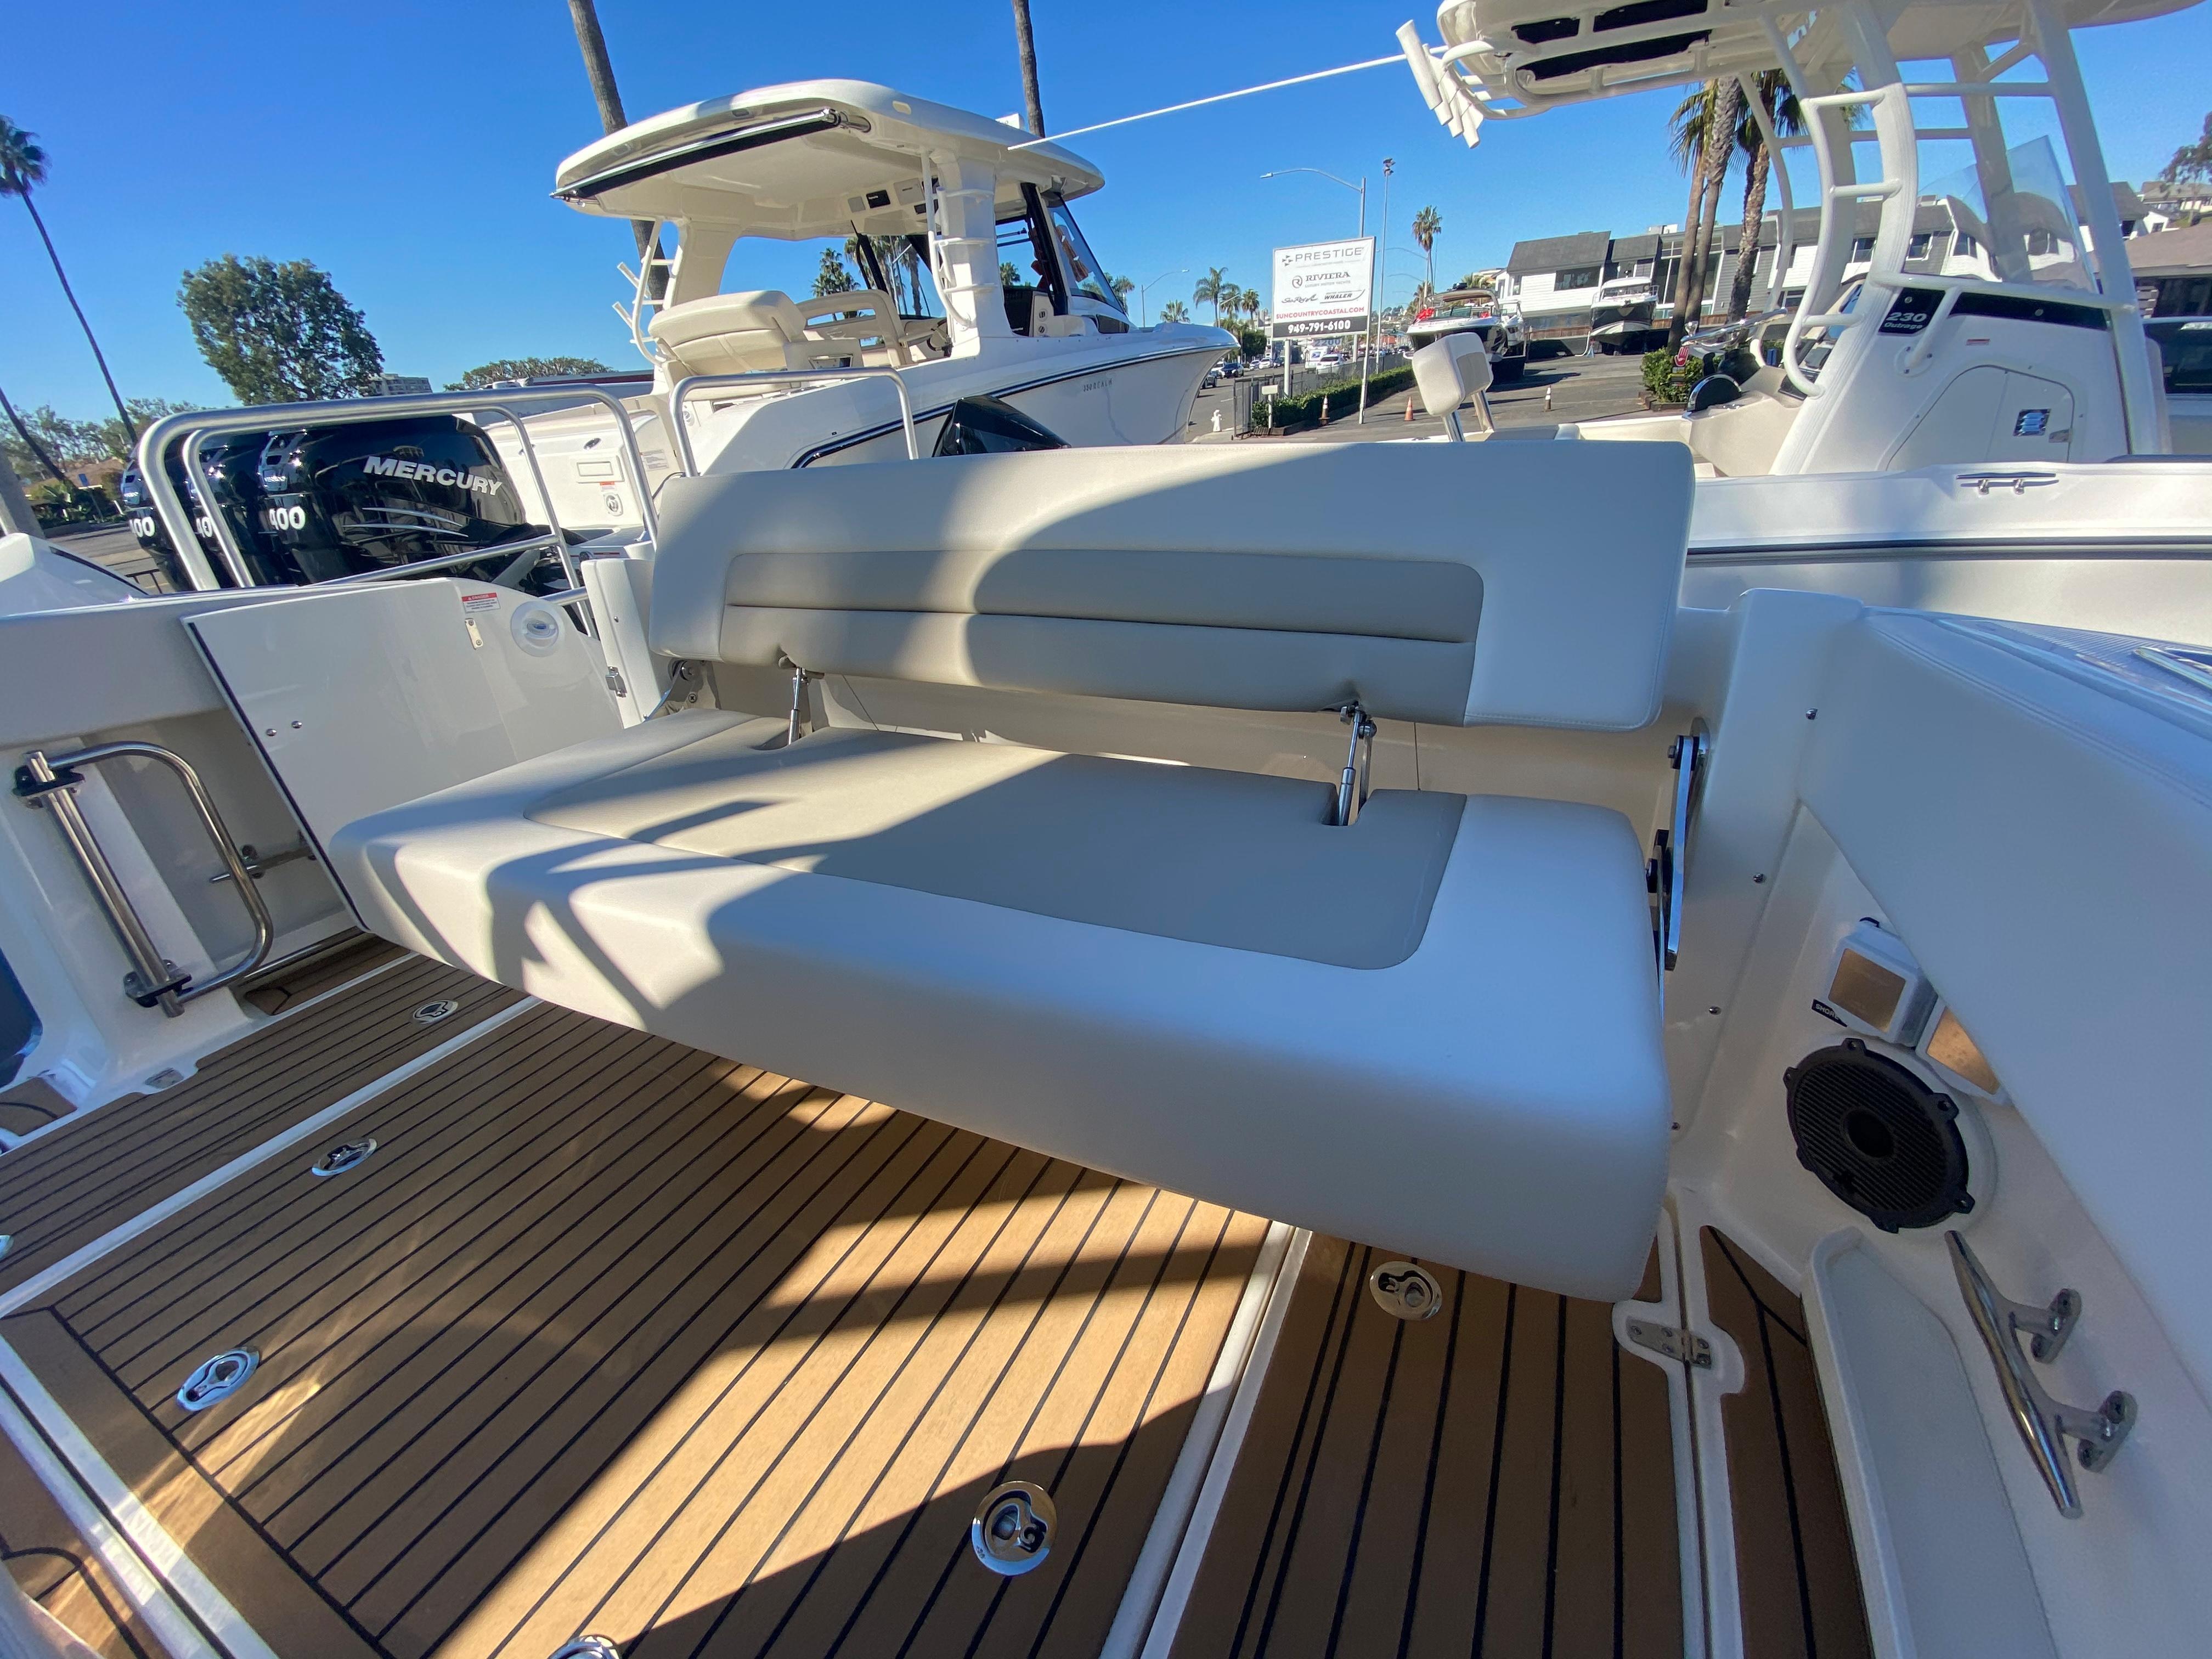 2021 Boston Whaler 320 Vantage #BW1073J inventory image at Sun Country Coastal in Newport Beach